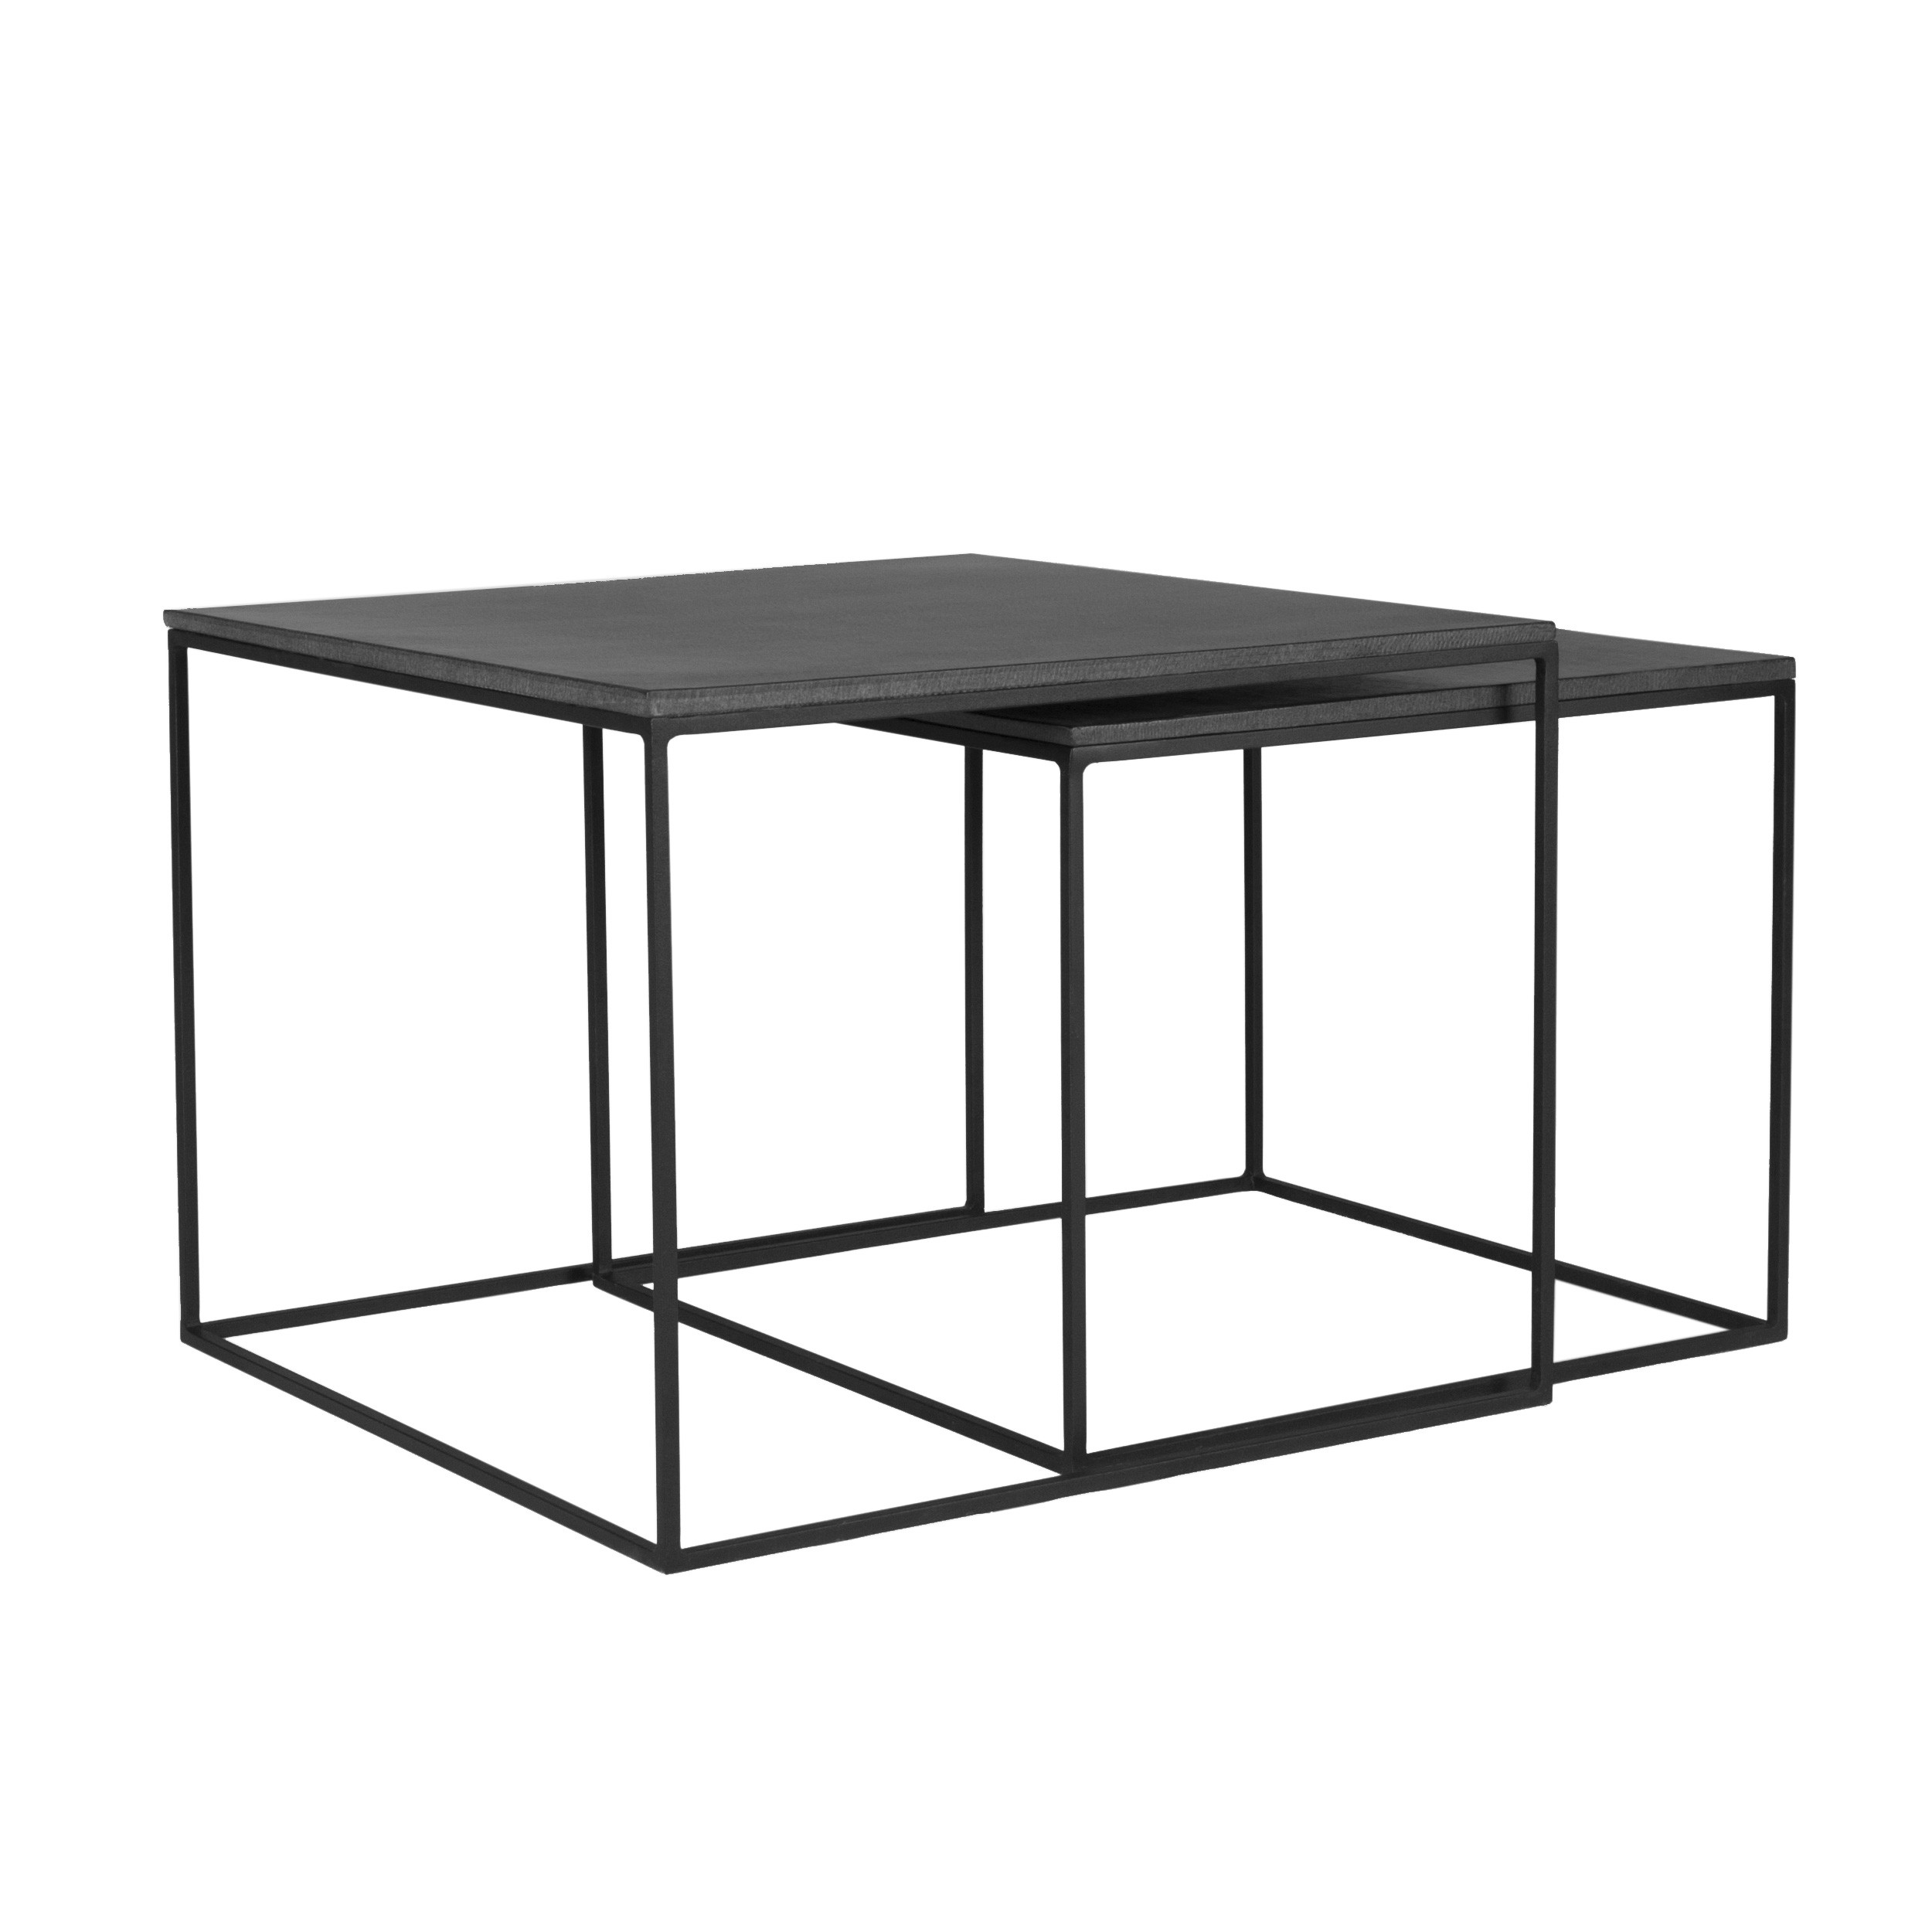 table basse gigogne carr e nevados lavastone lot de 2 achetez les tables basses gigognes. Black Bedroom Furniture Sets. Home Design Ideas